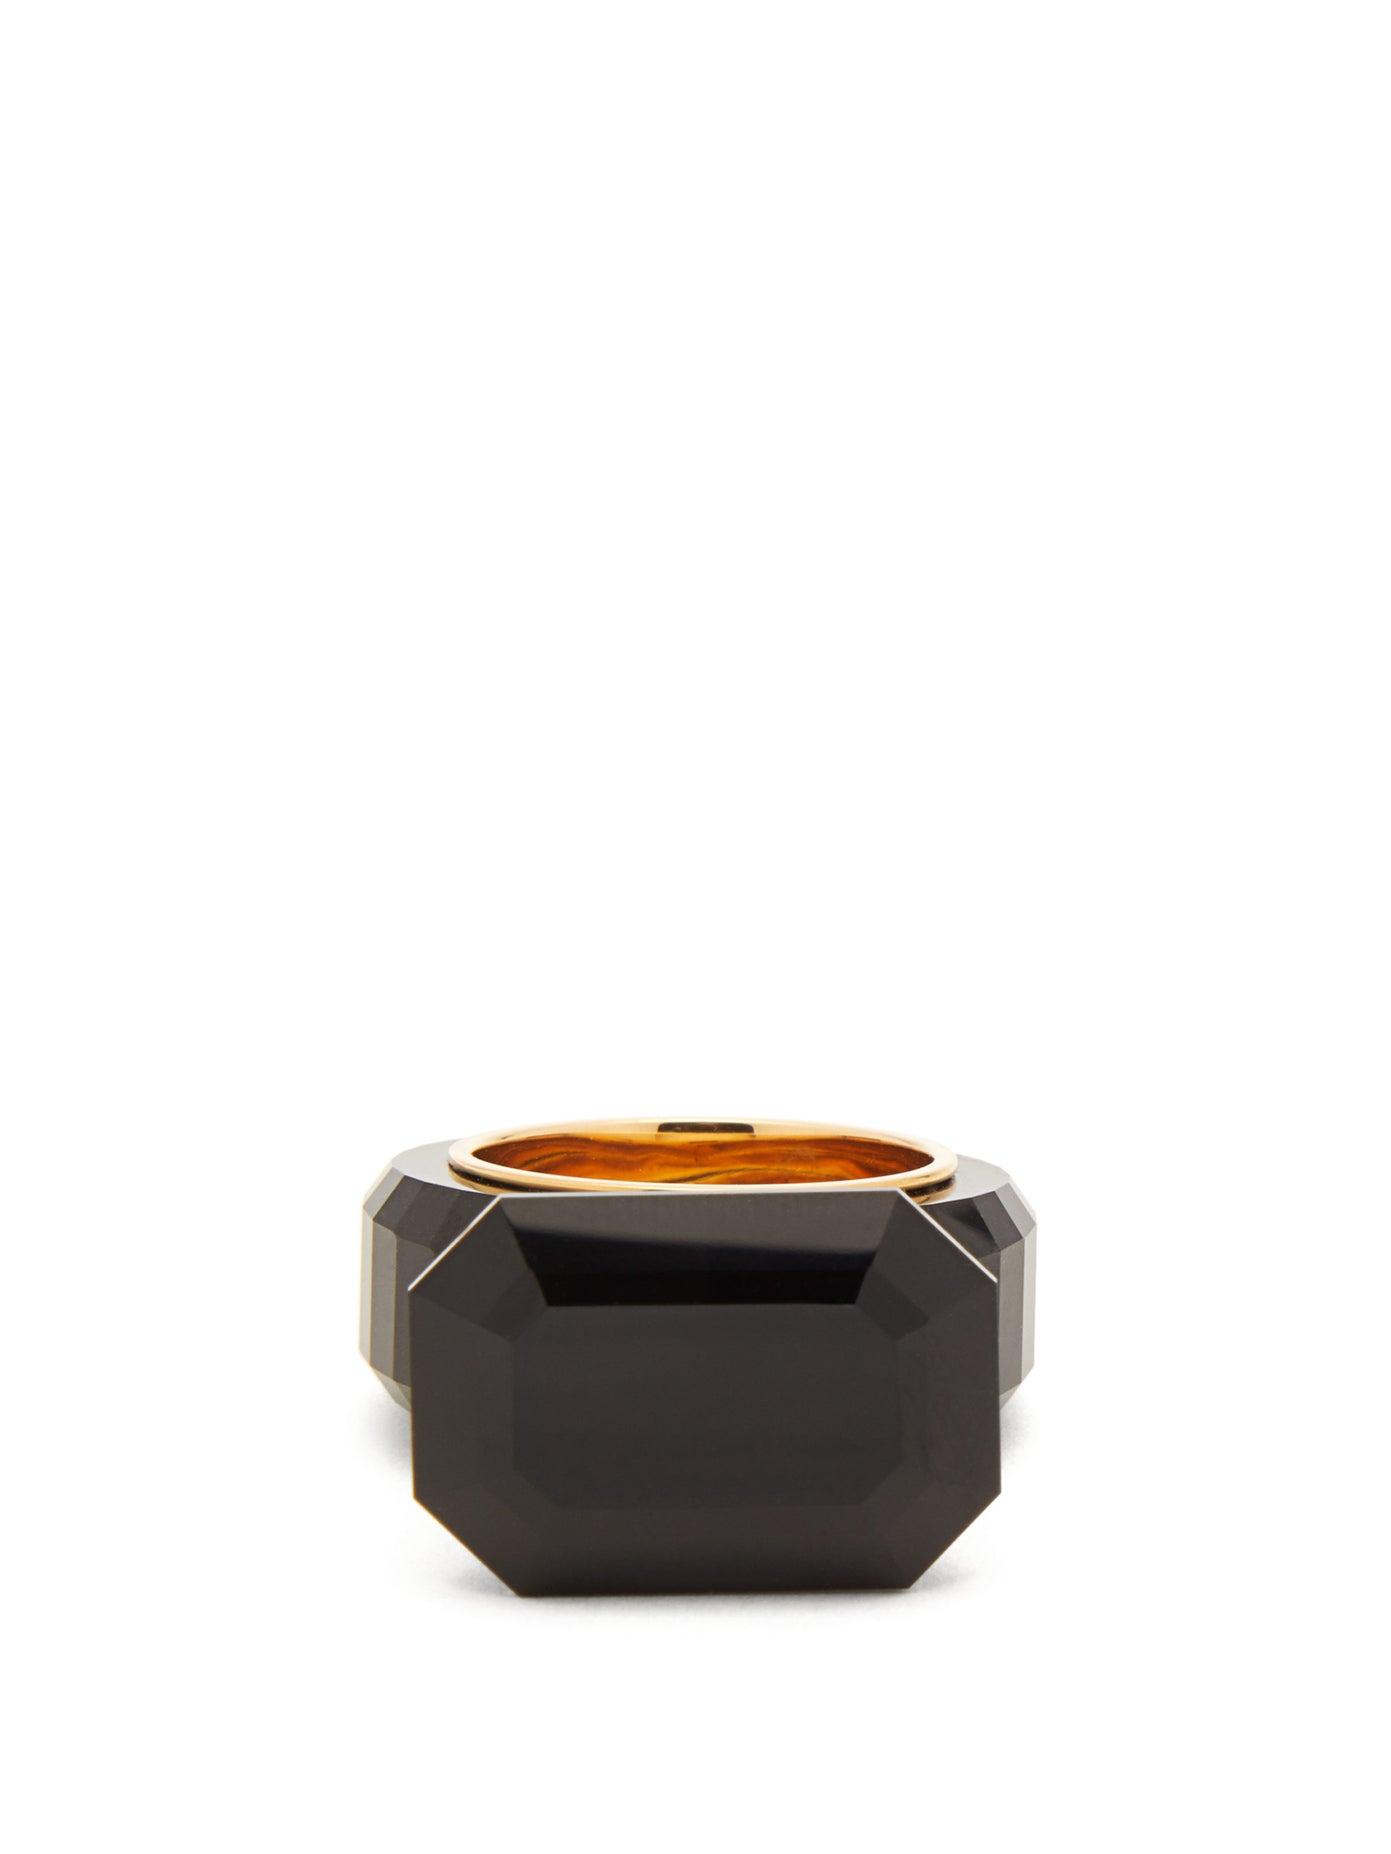 خاتم بتصميم مميز مع حجر أسود كبير من Bottega Veneta